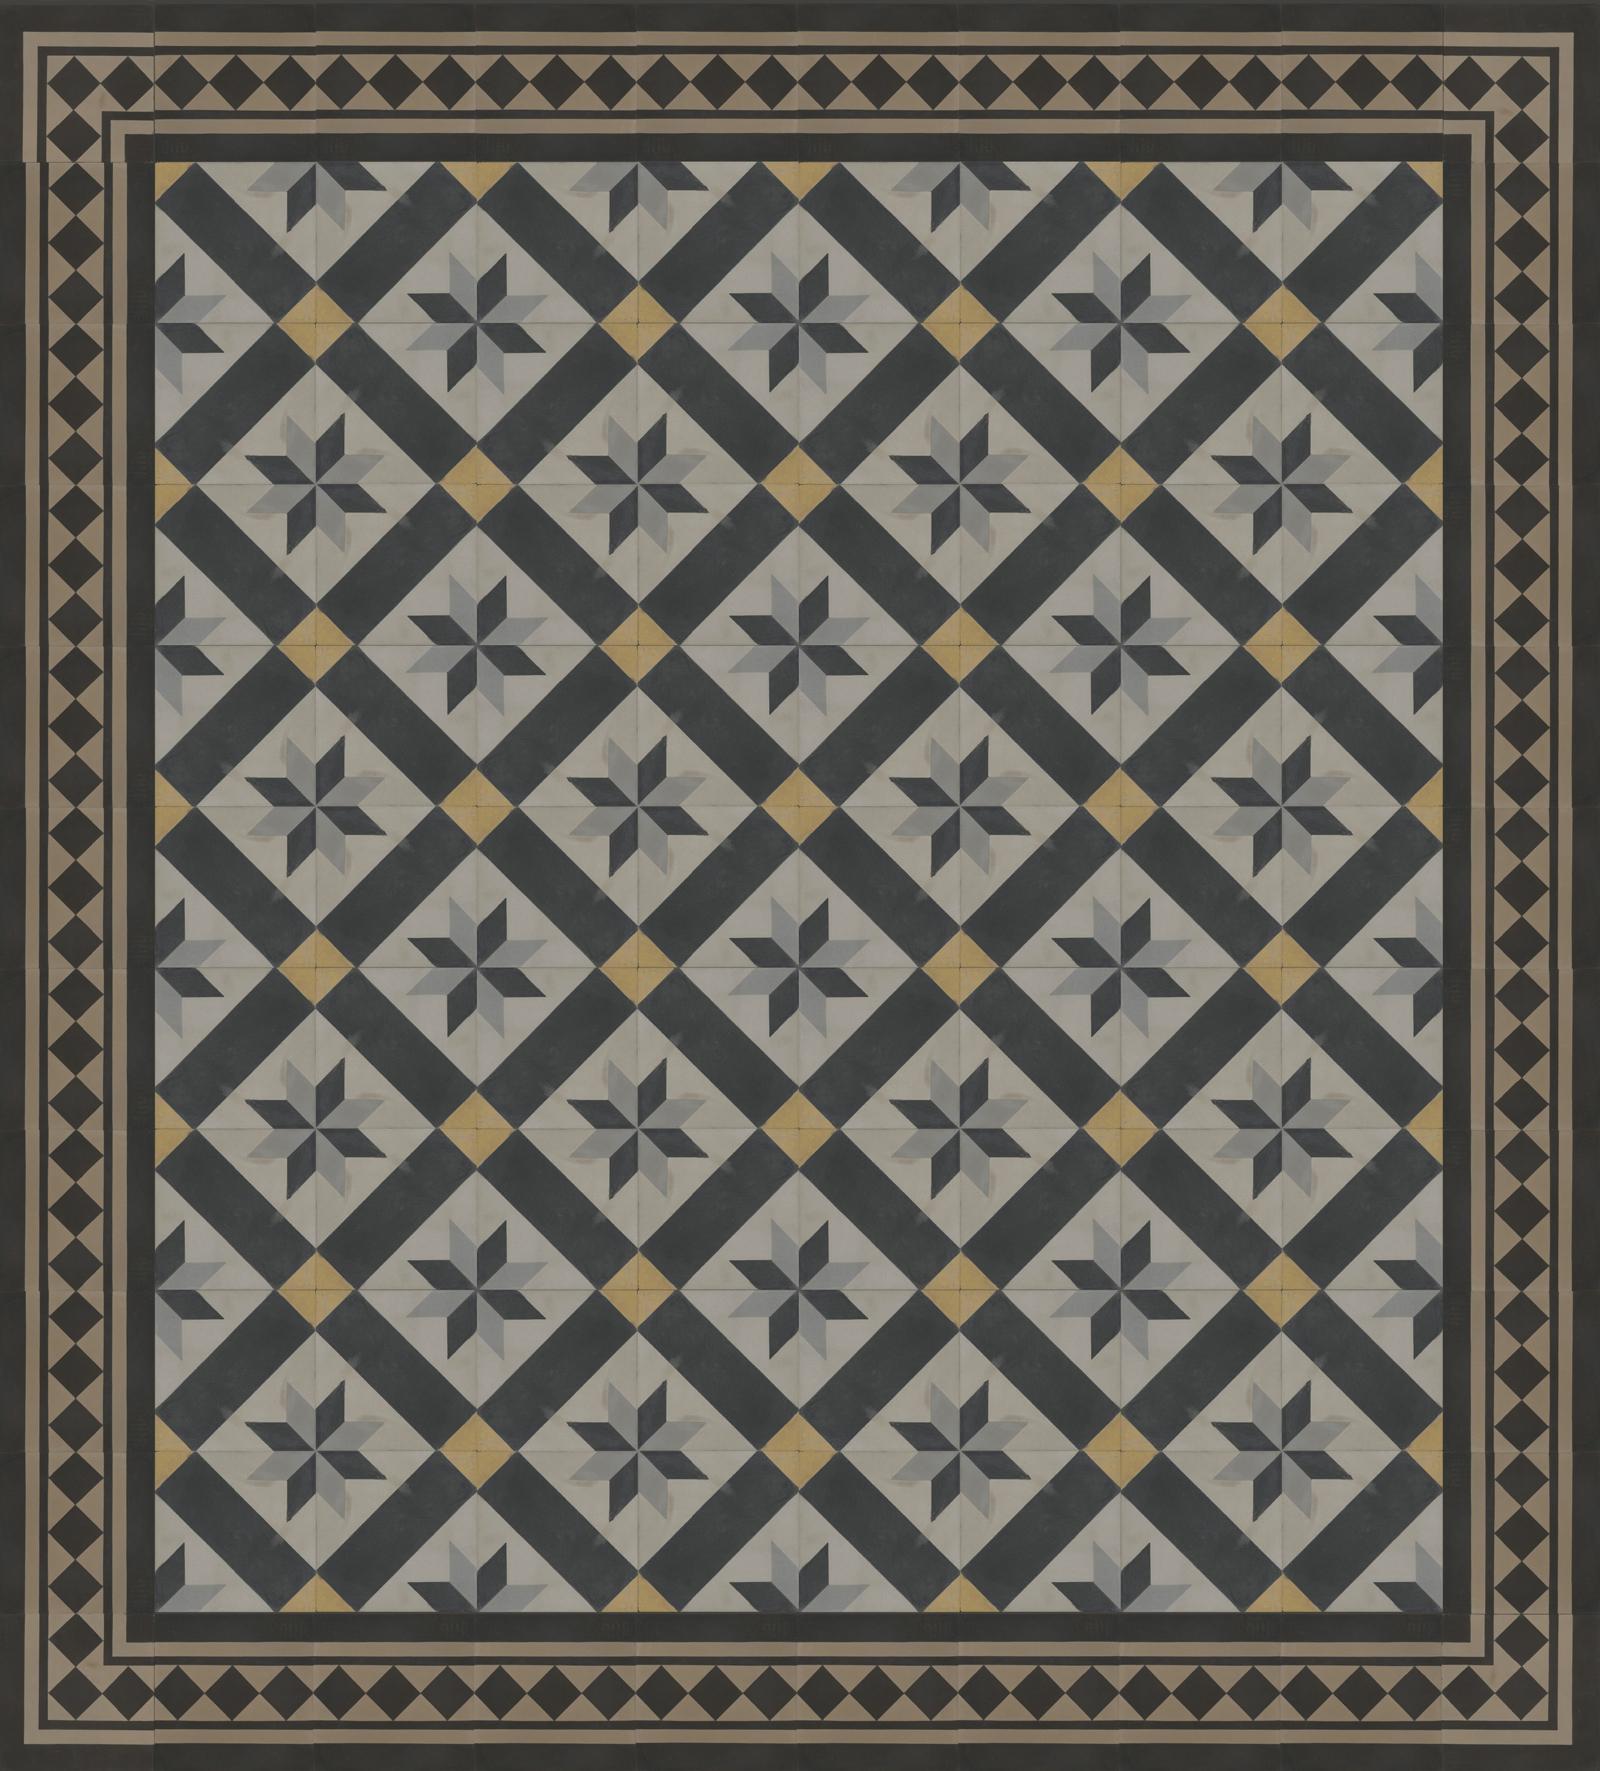 zementmosaikplatten-nr.51109-verlegemuster-viaplatten | 51109